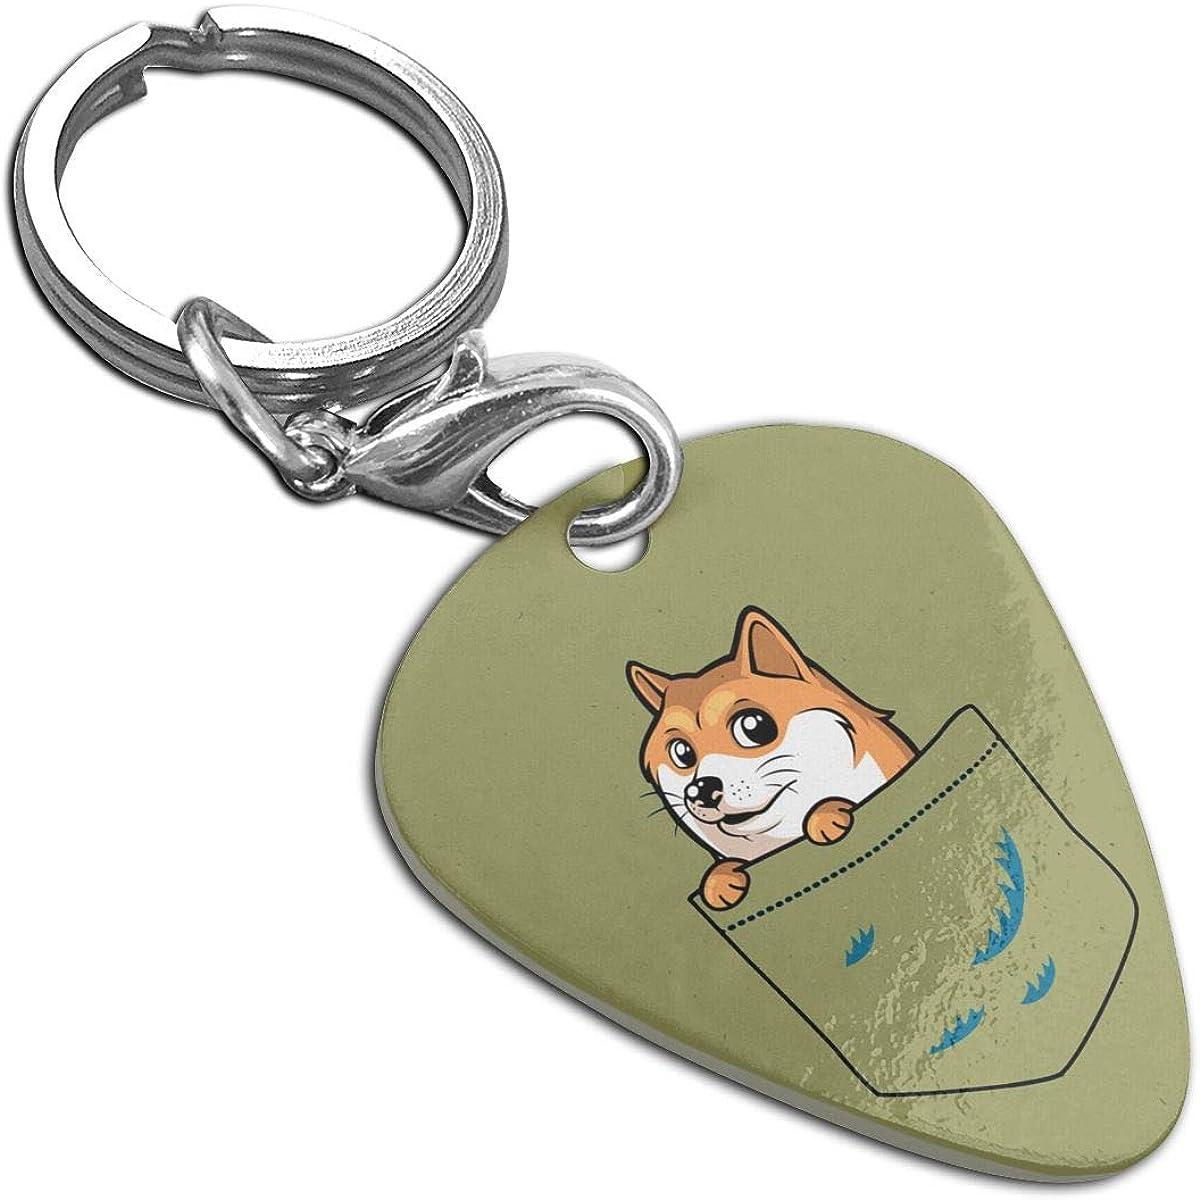 Dingo Image Metal Chunky Keyring in Gift Box